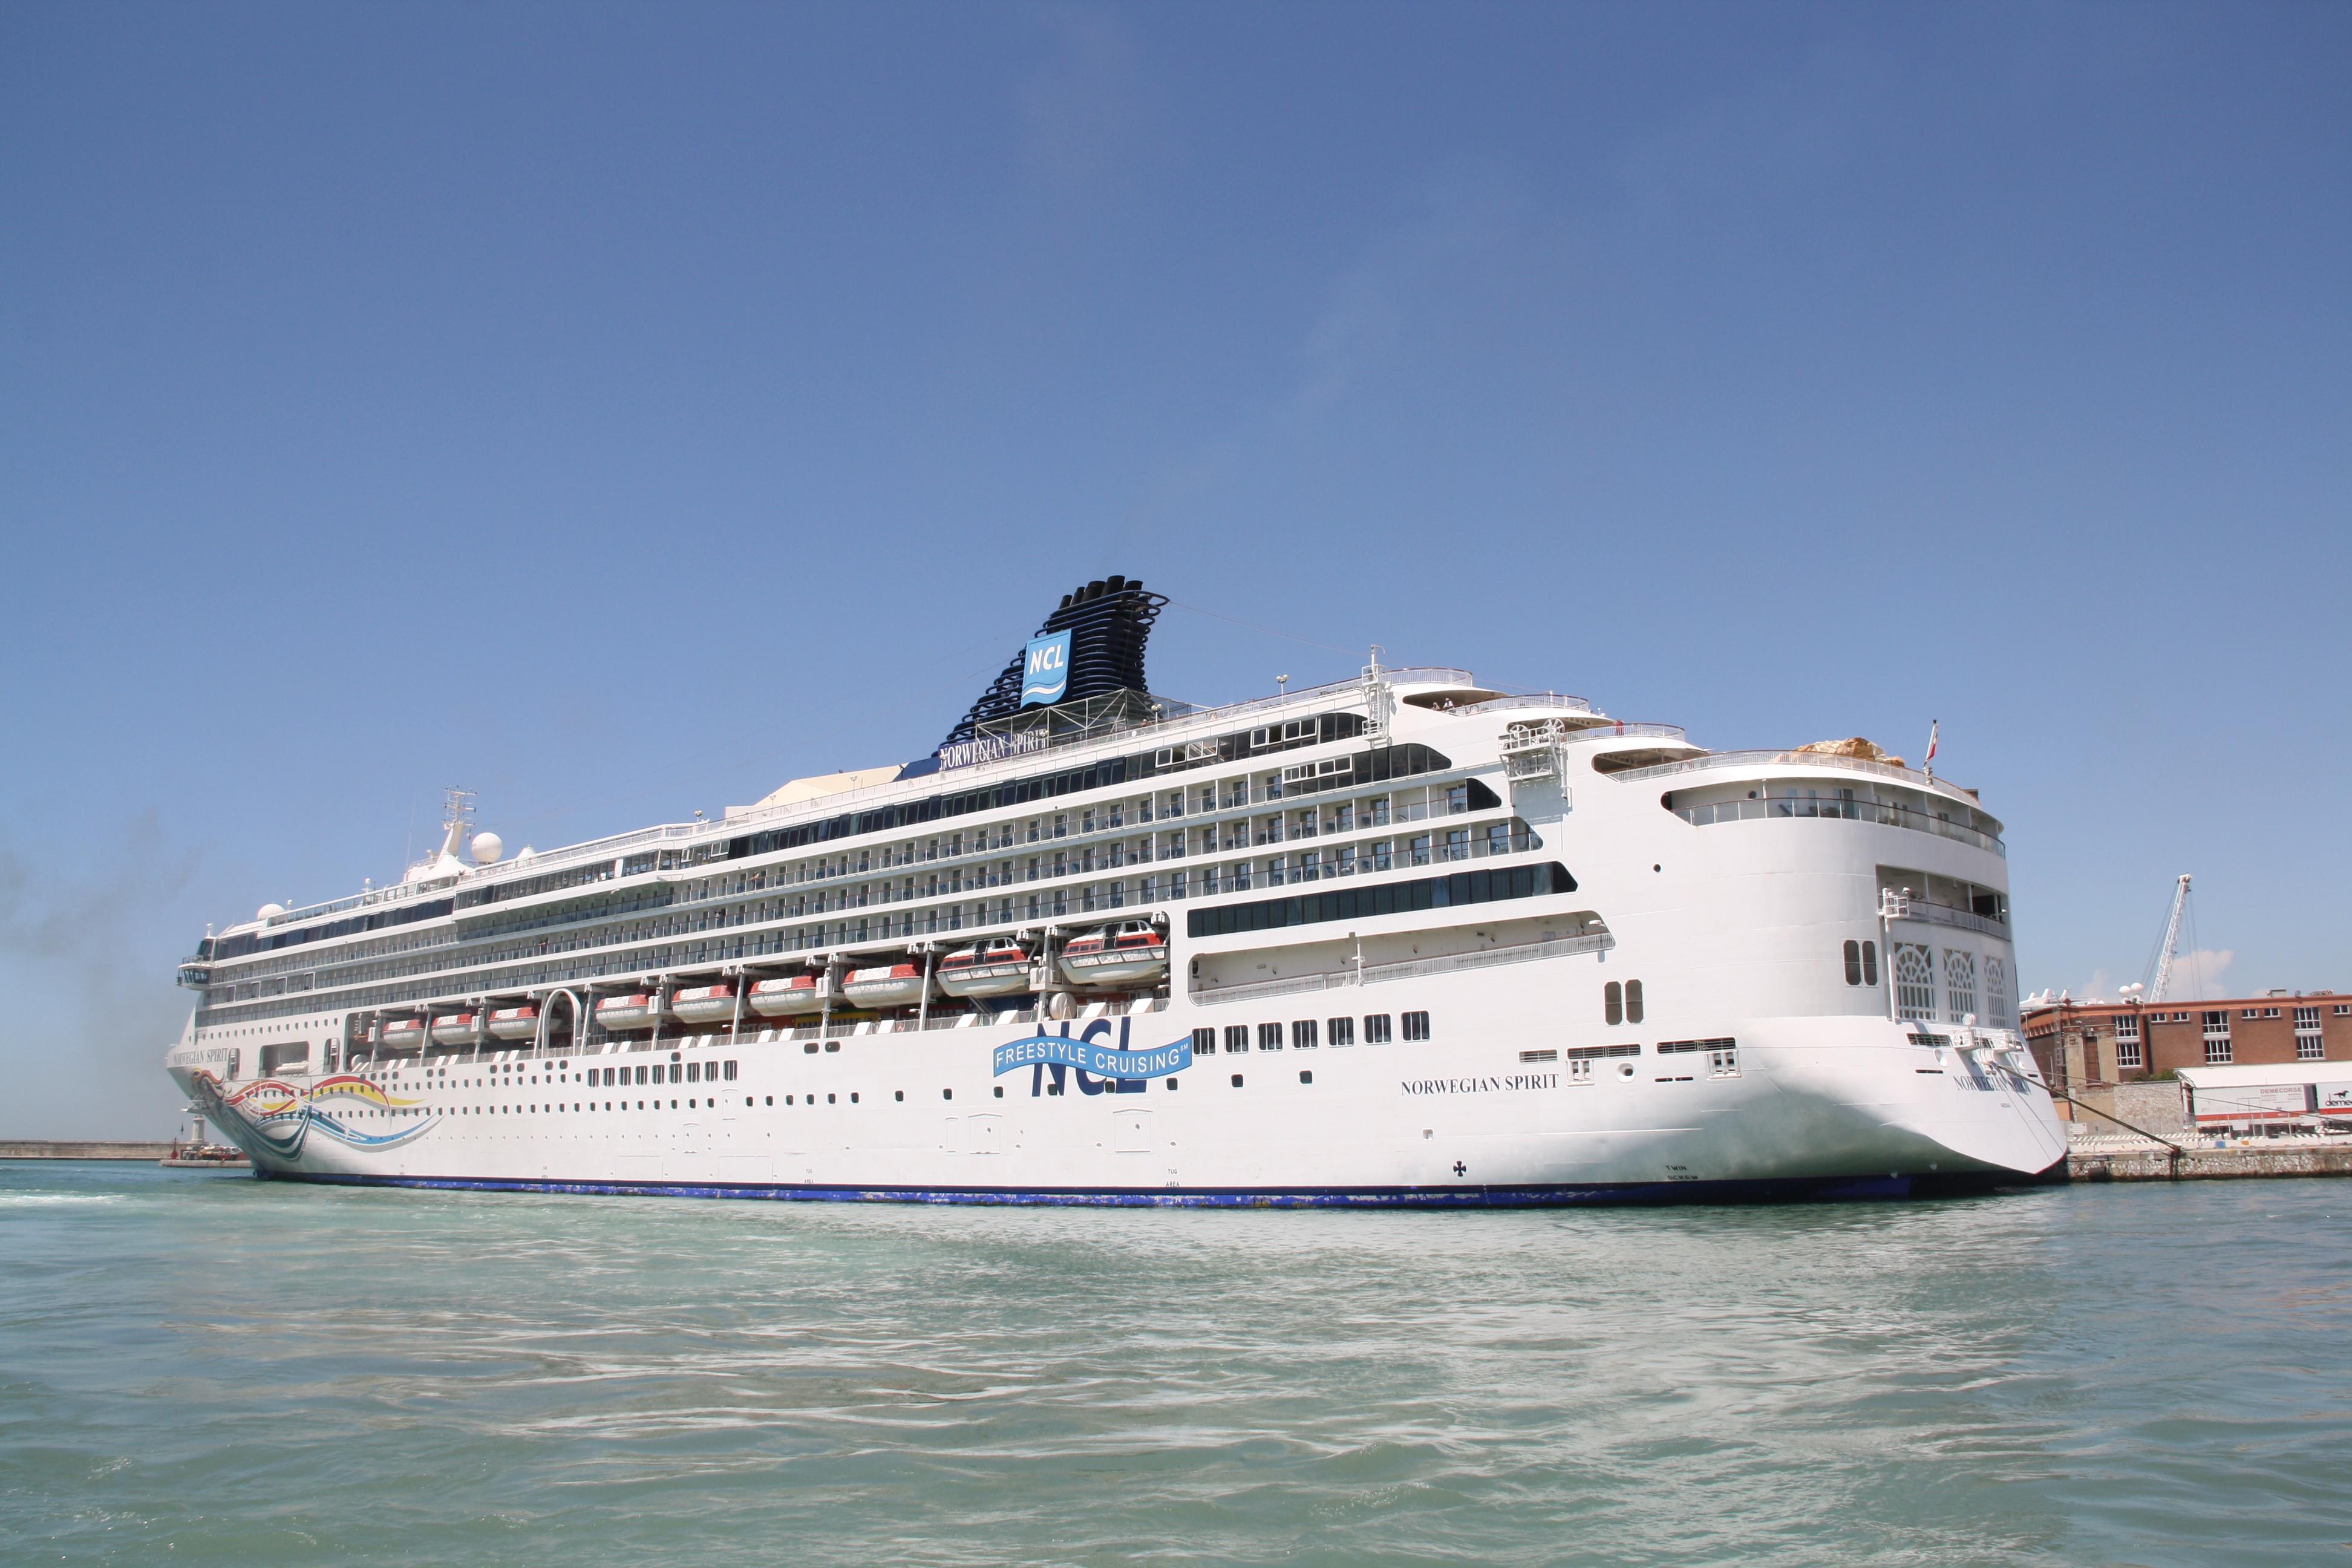 Gambling age in norwegian cruise line legal status of online gambling